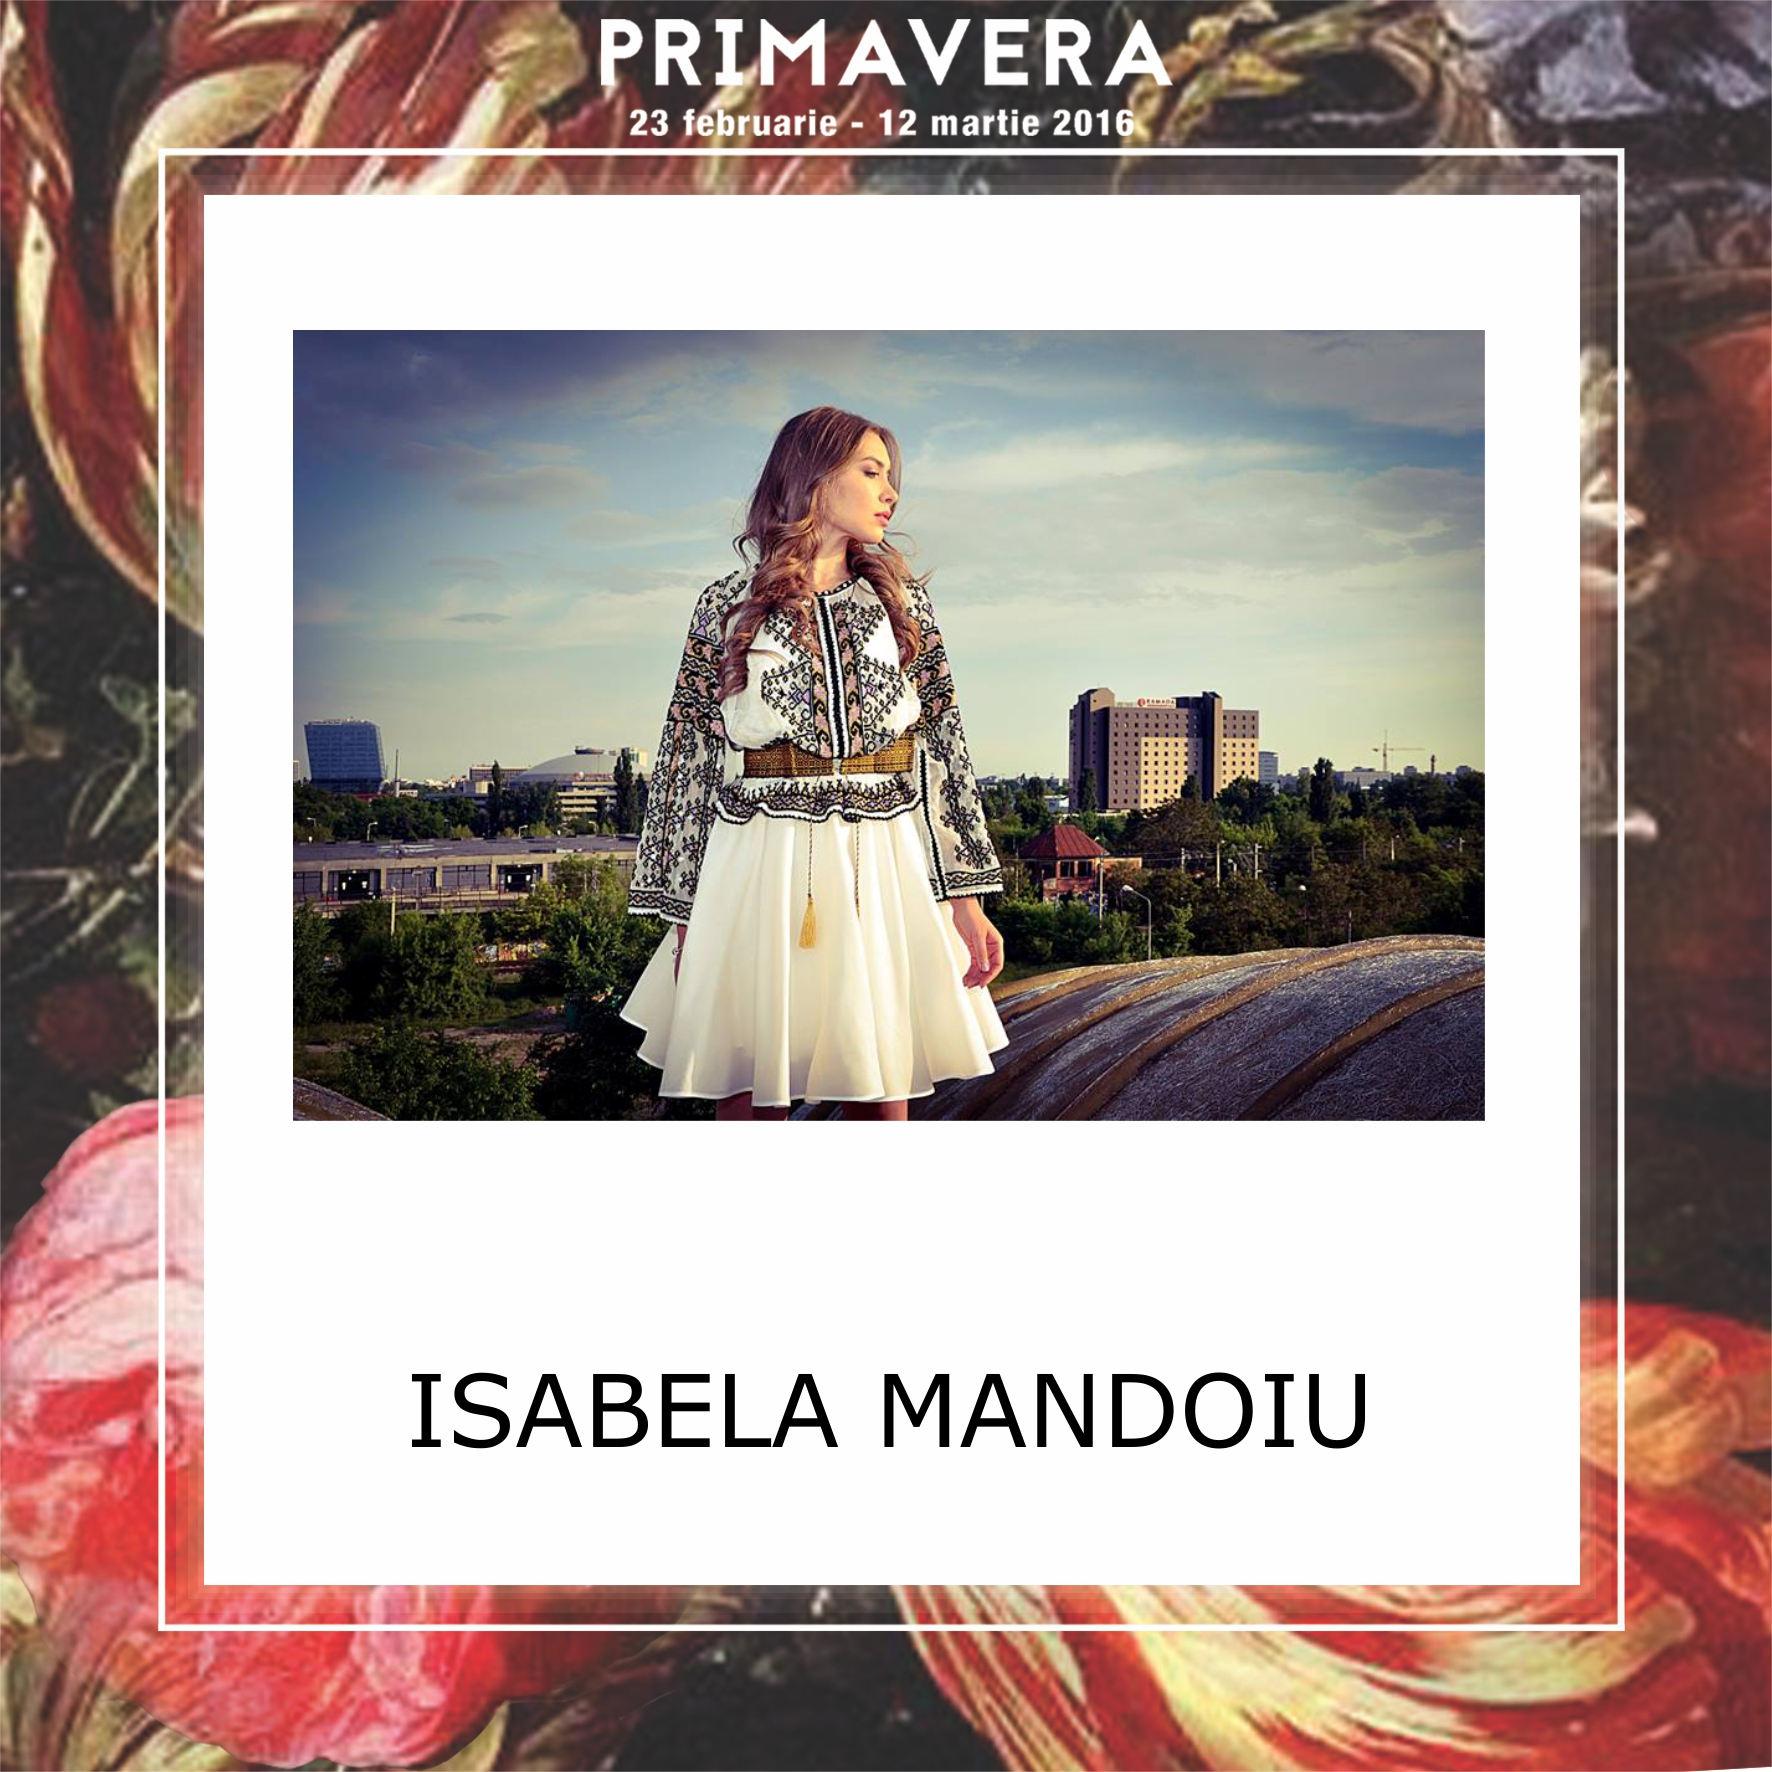 Isabela Mandoiu